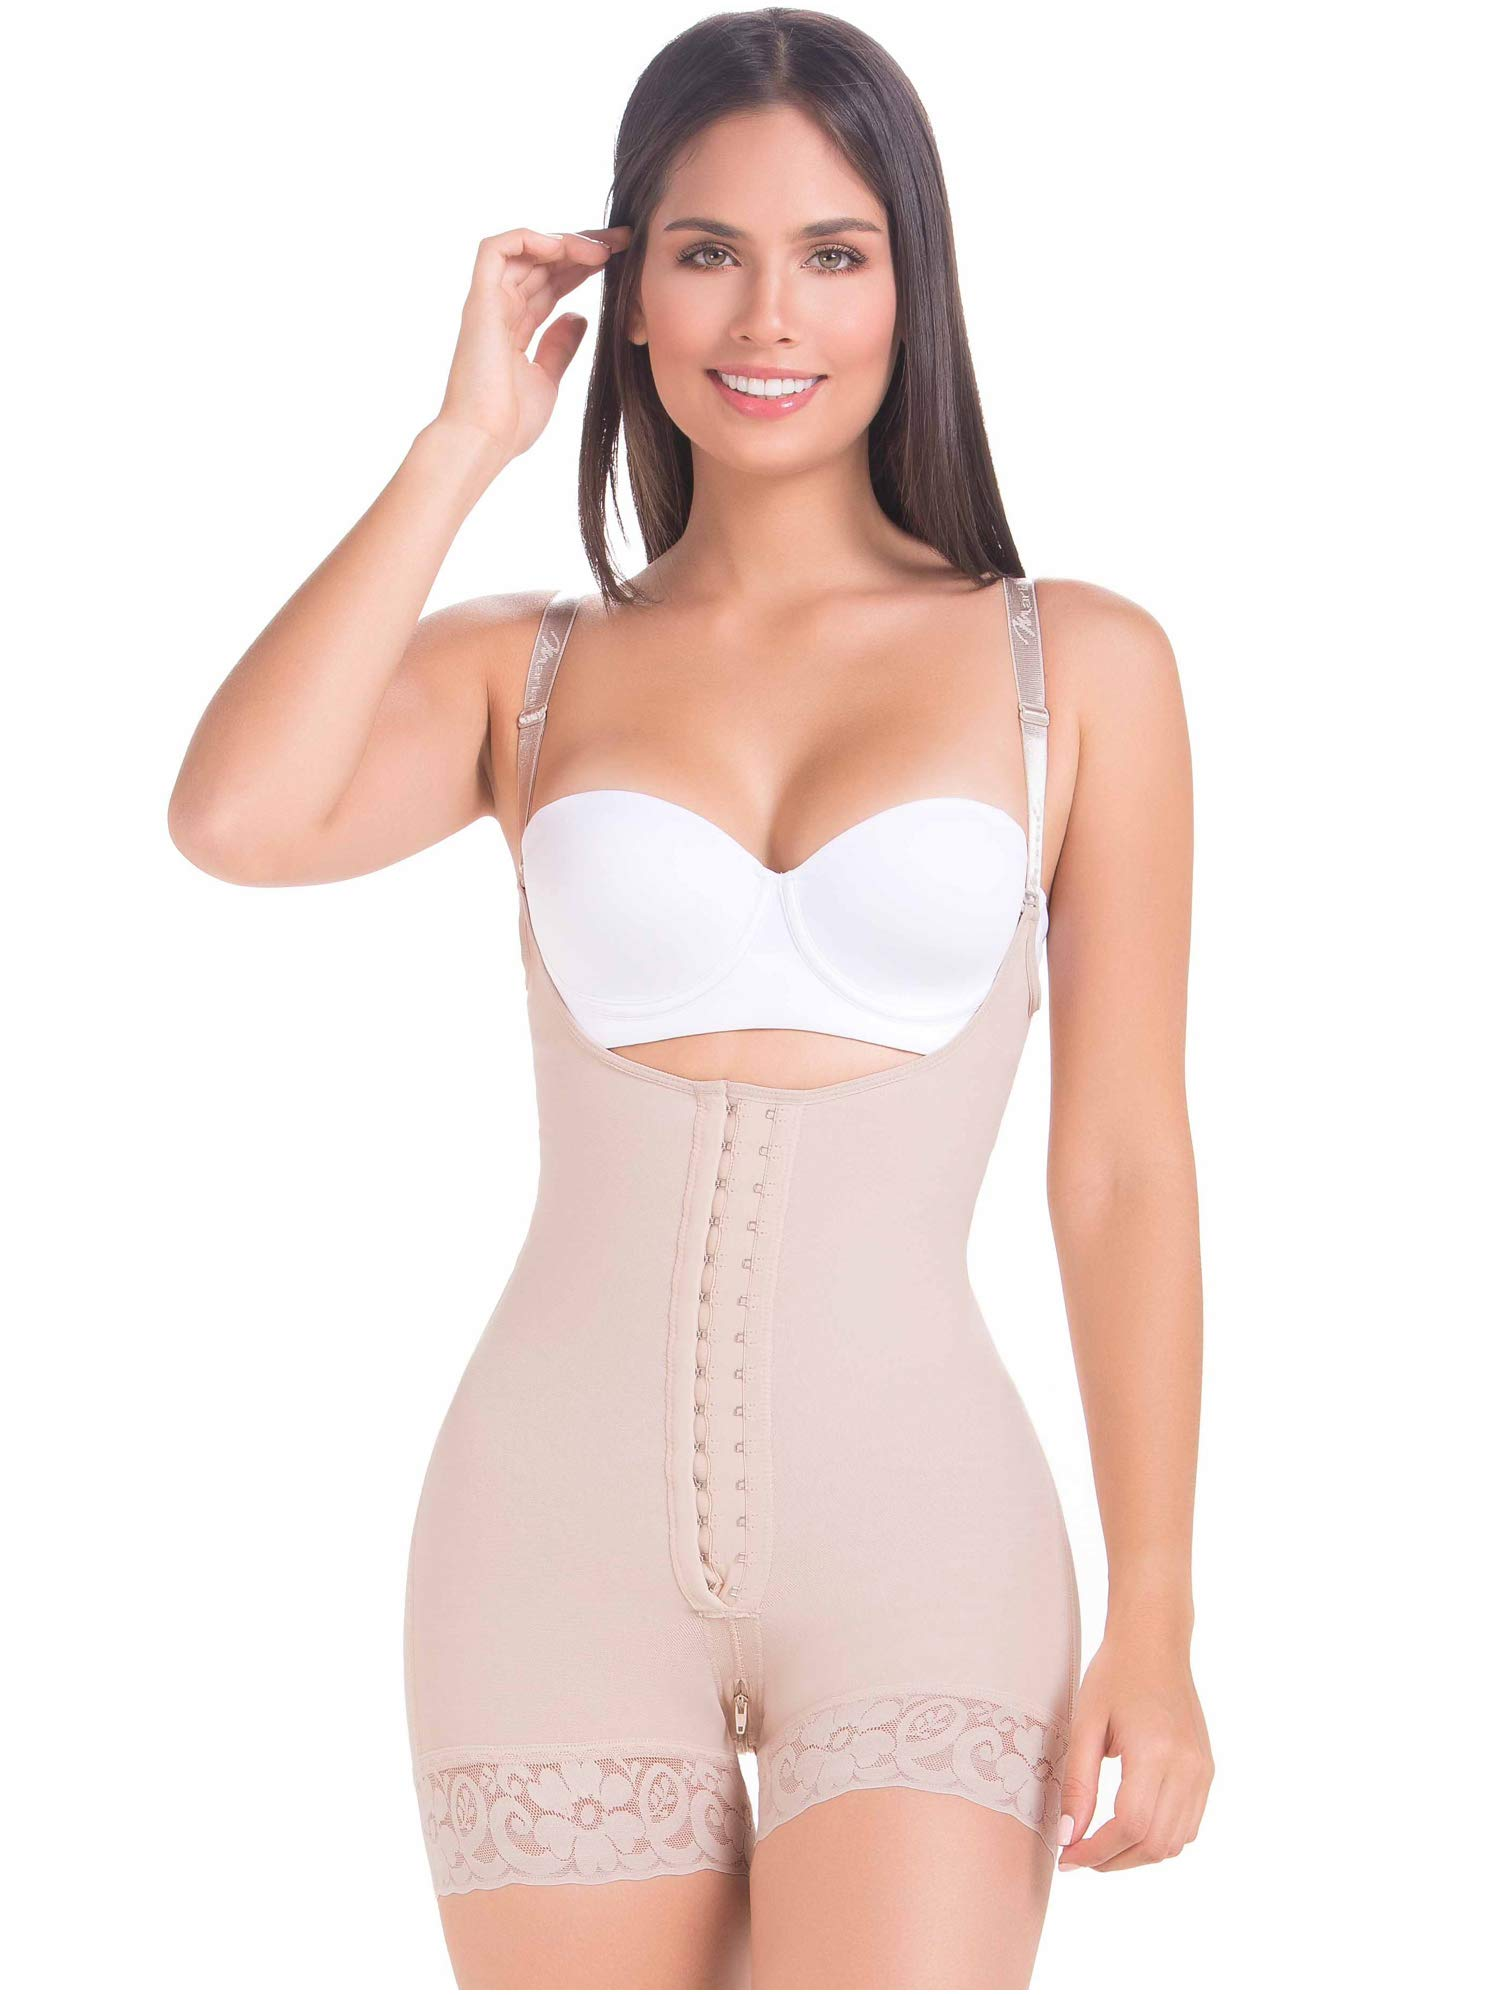 MARIAE FP100 Tummy Control Braless Shapewear | Fajas Colombianas Reductoras